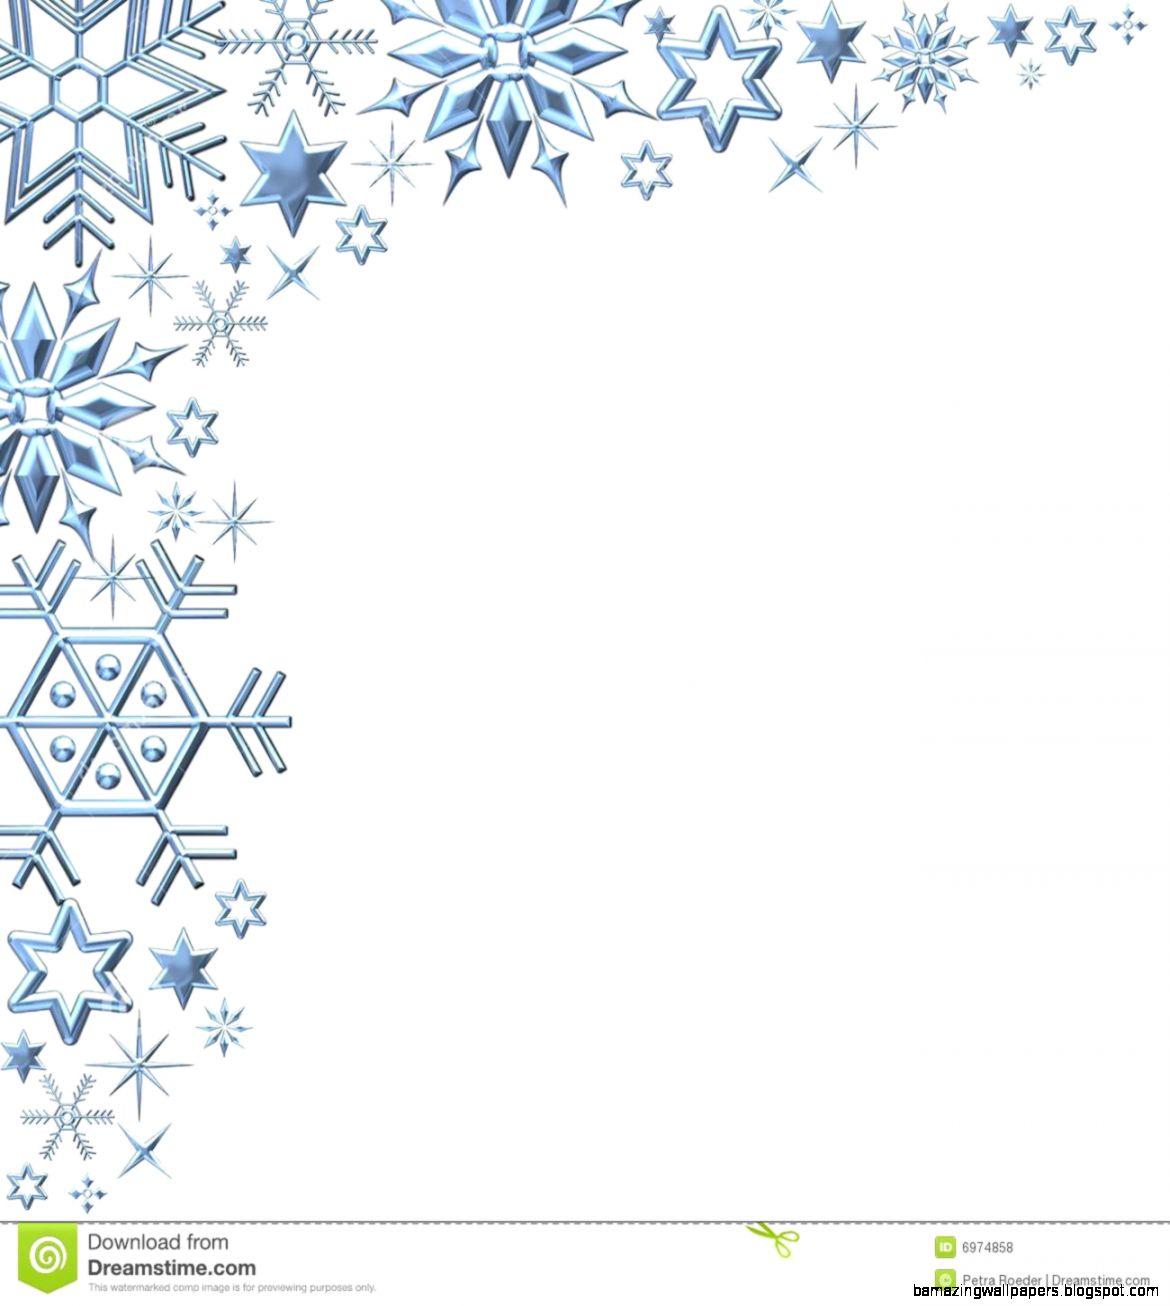 Free Snowflake Border Clipart  School Clip Art